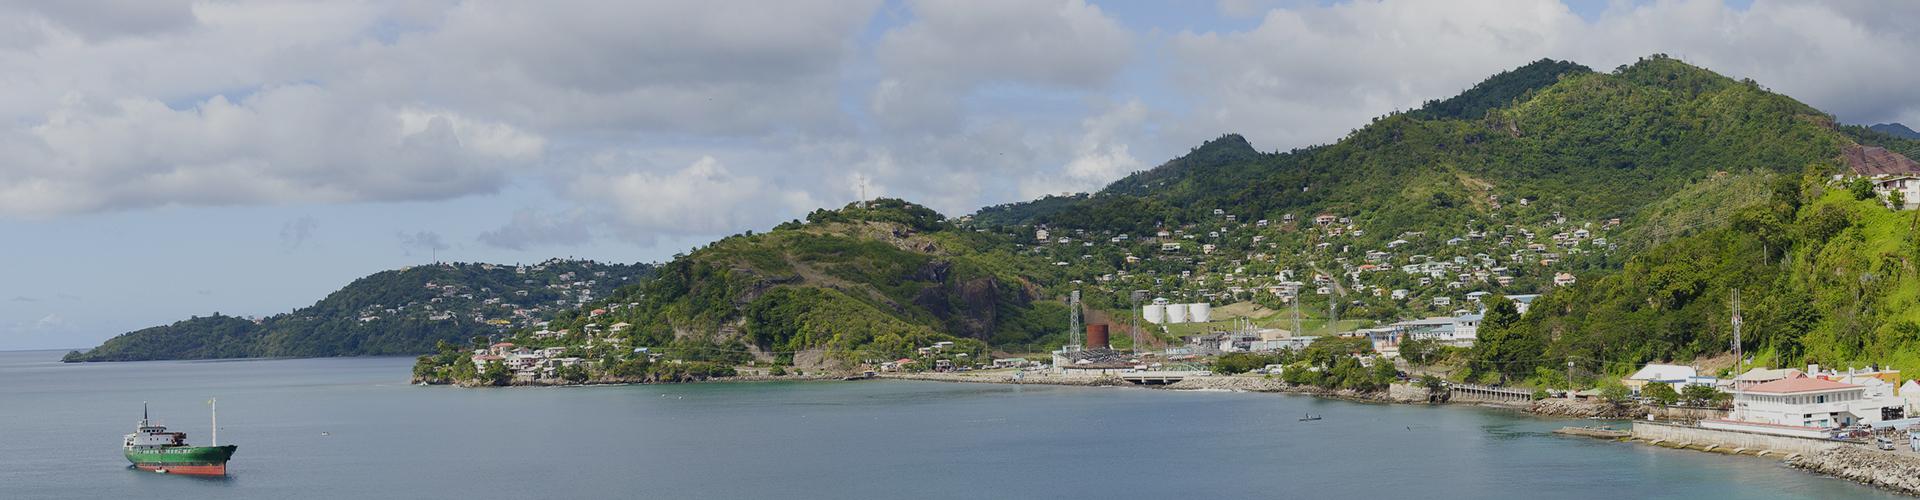 Landmark photograph of Grenada